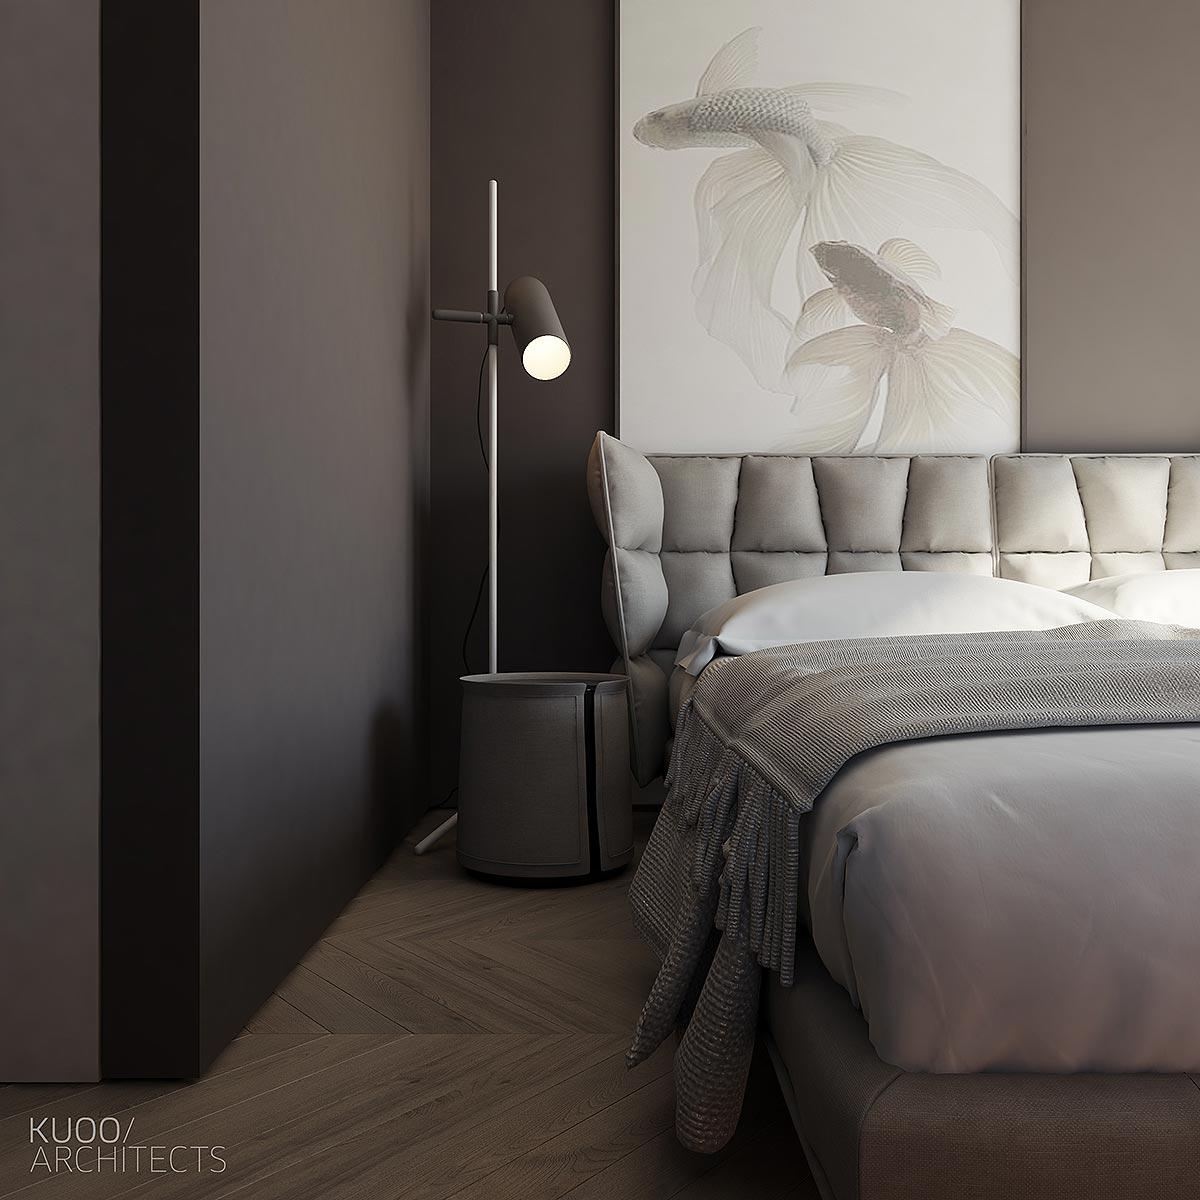 K_kuoo_architects_warsaw_minimal_interiors_contemporaryjpg